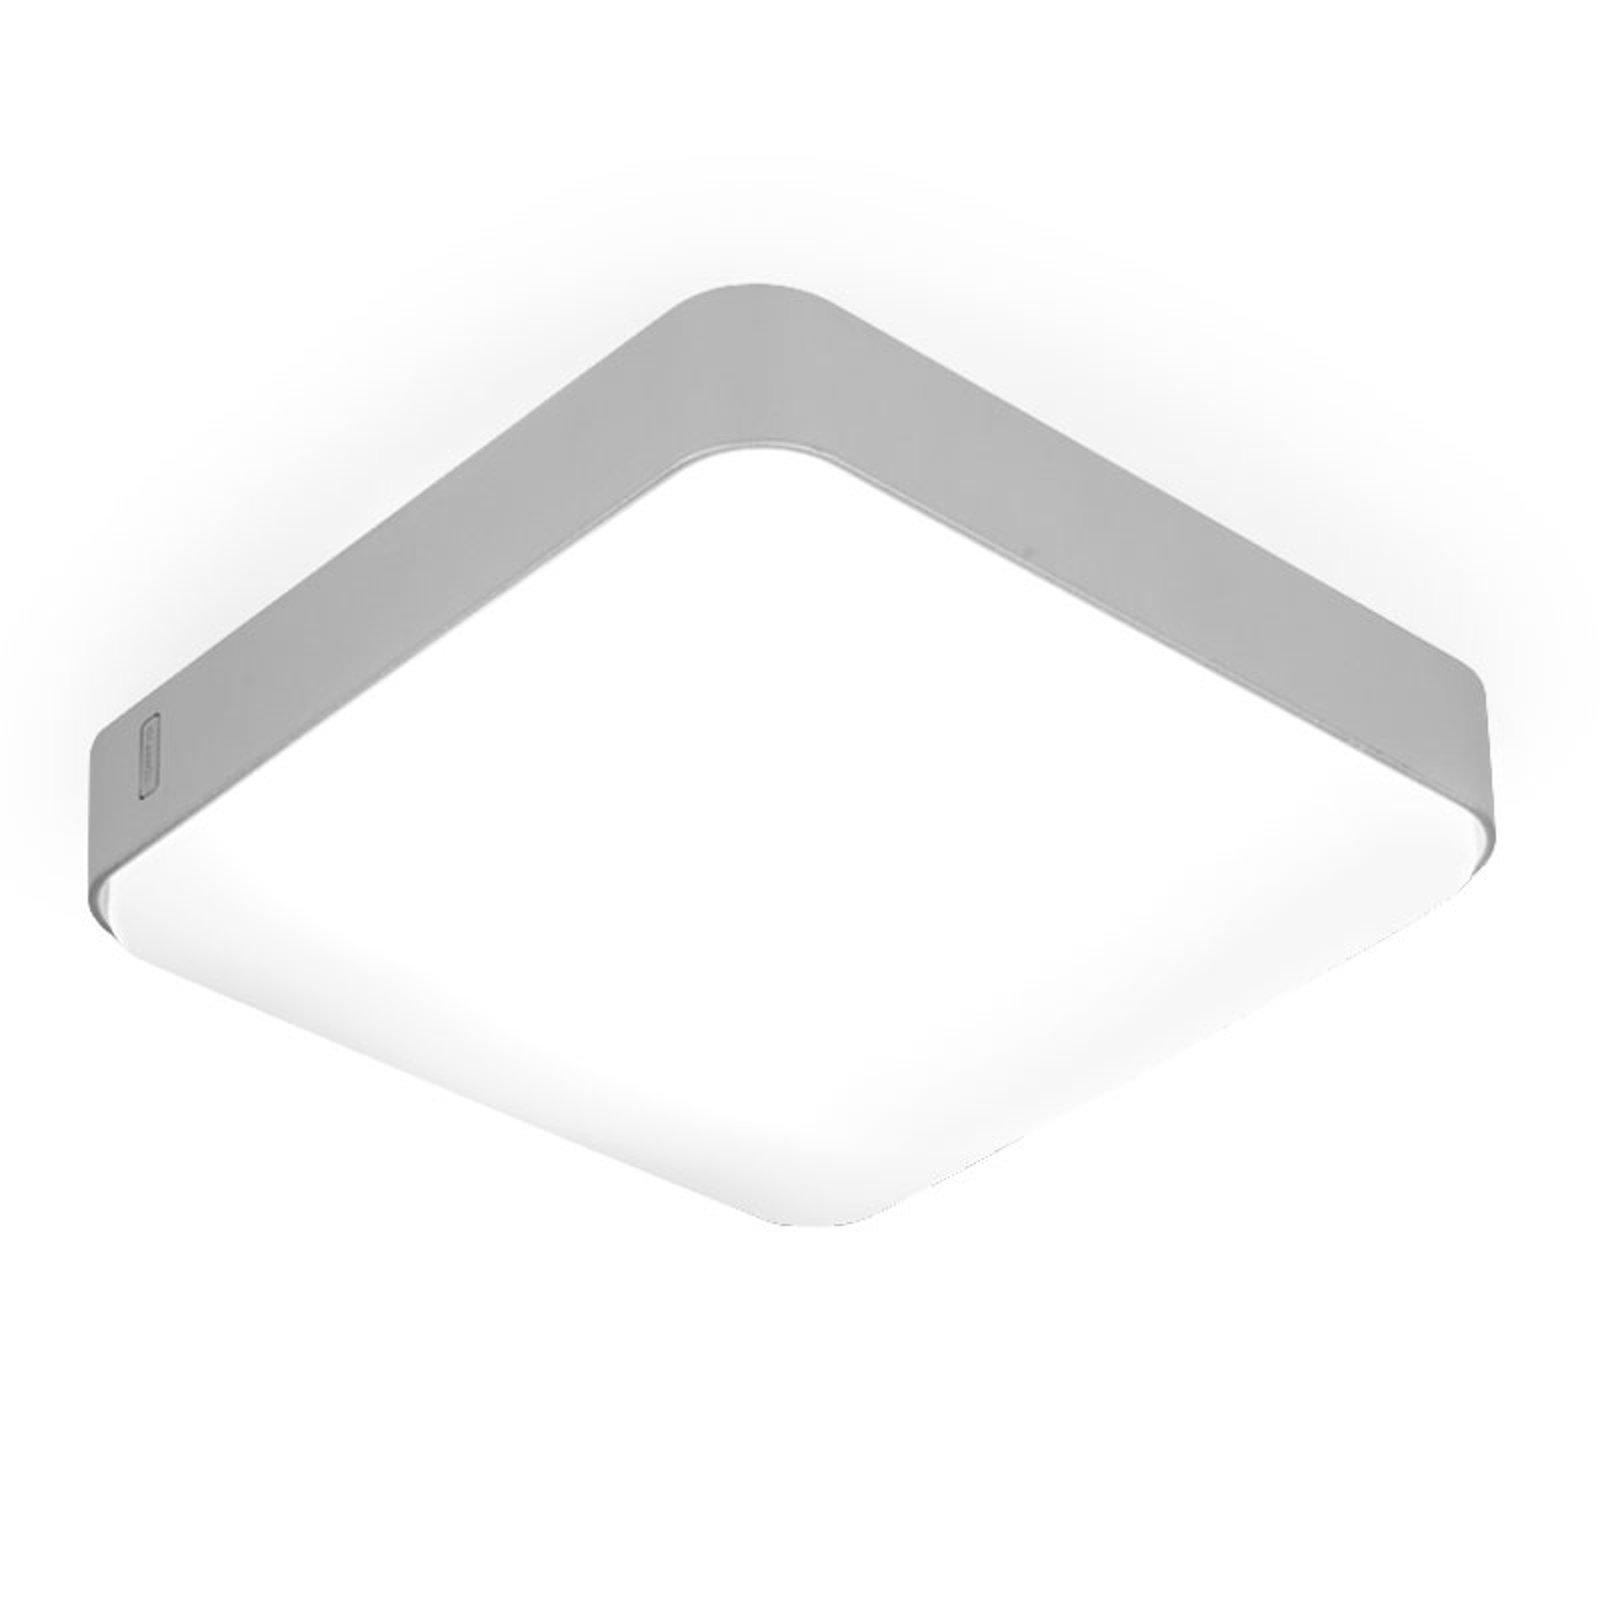 A20-SQ LED-taklampe, 40x40 cm, 3 000 K